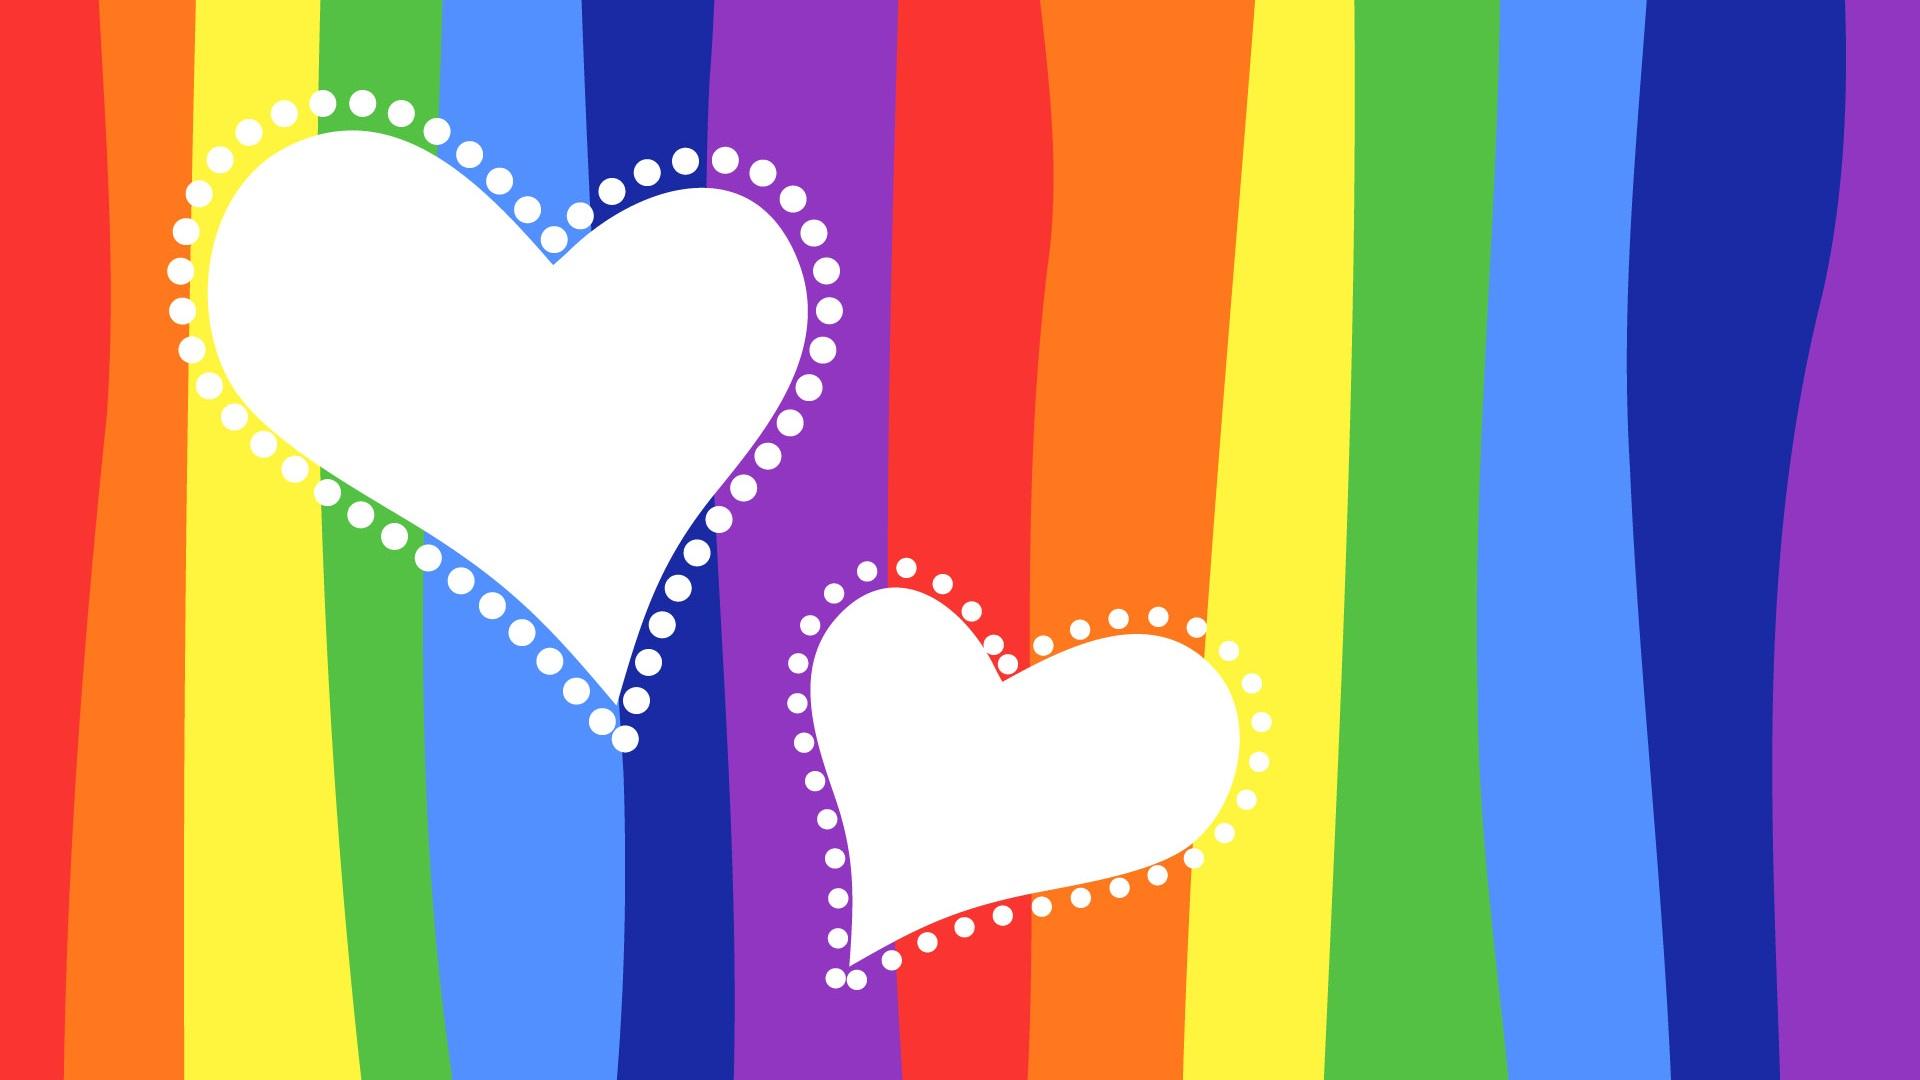 Love Images Stock Photos amp Vectors  Shutterstock